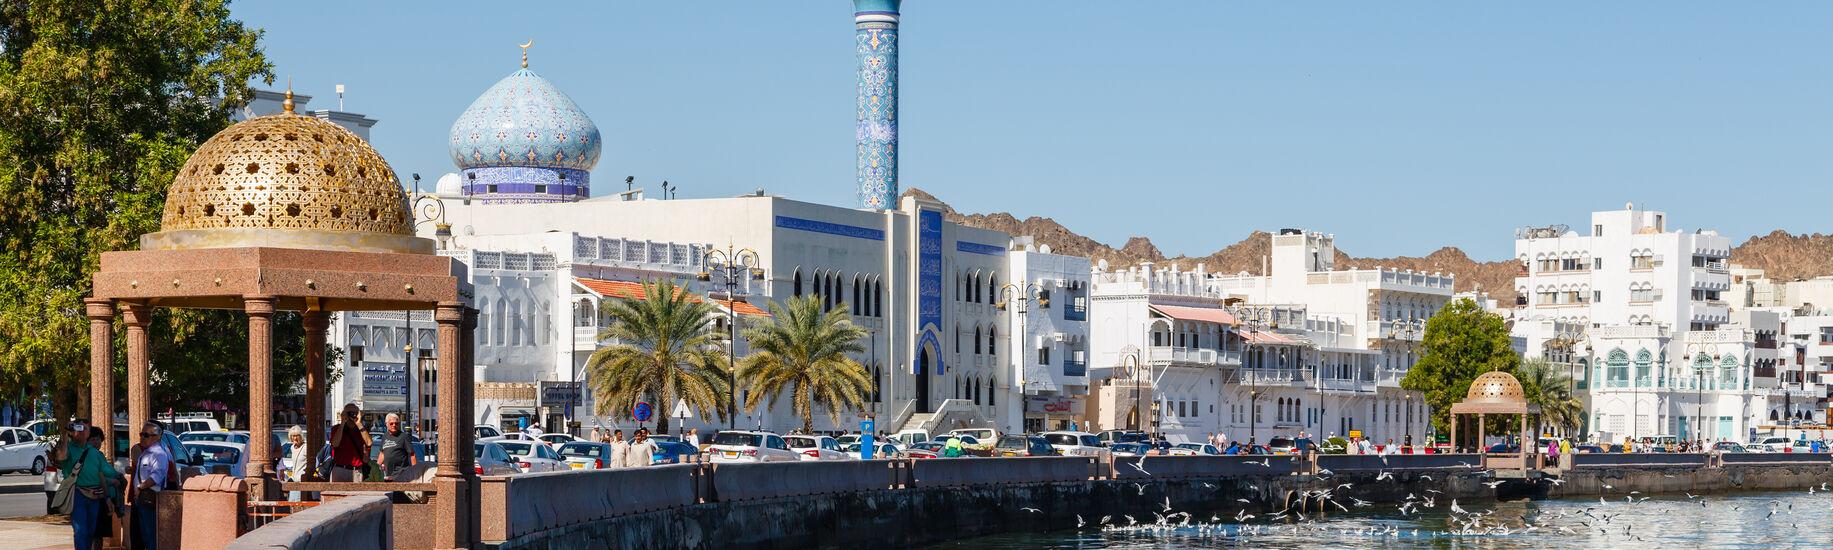 Oman City